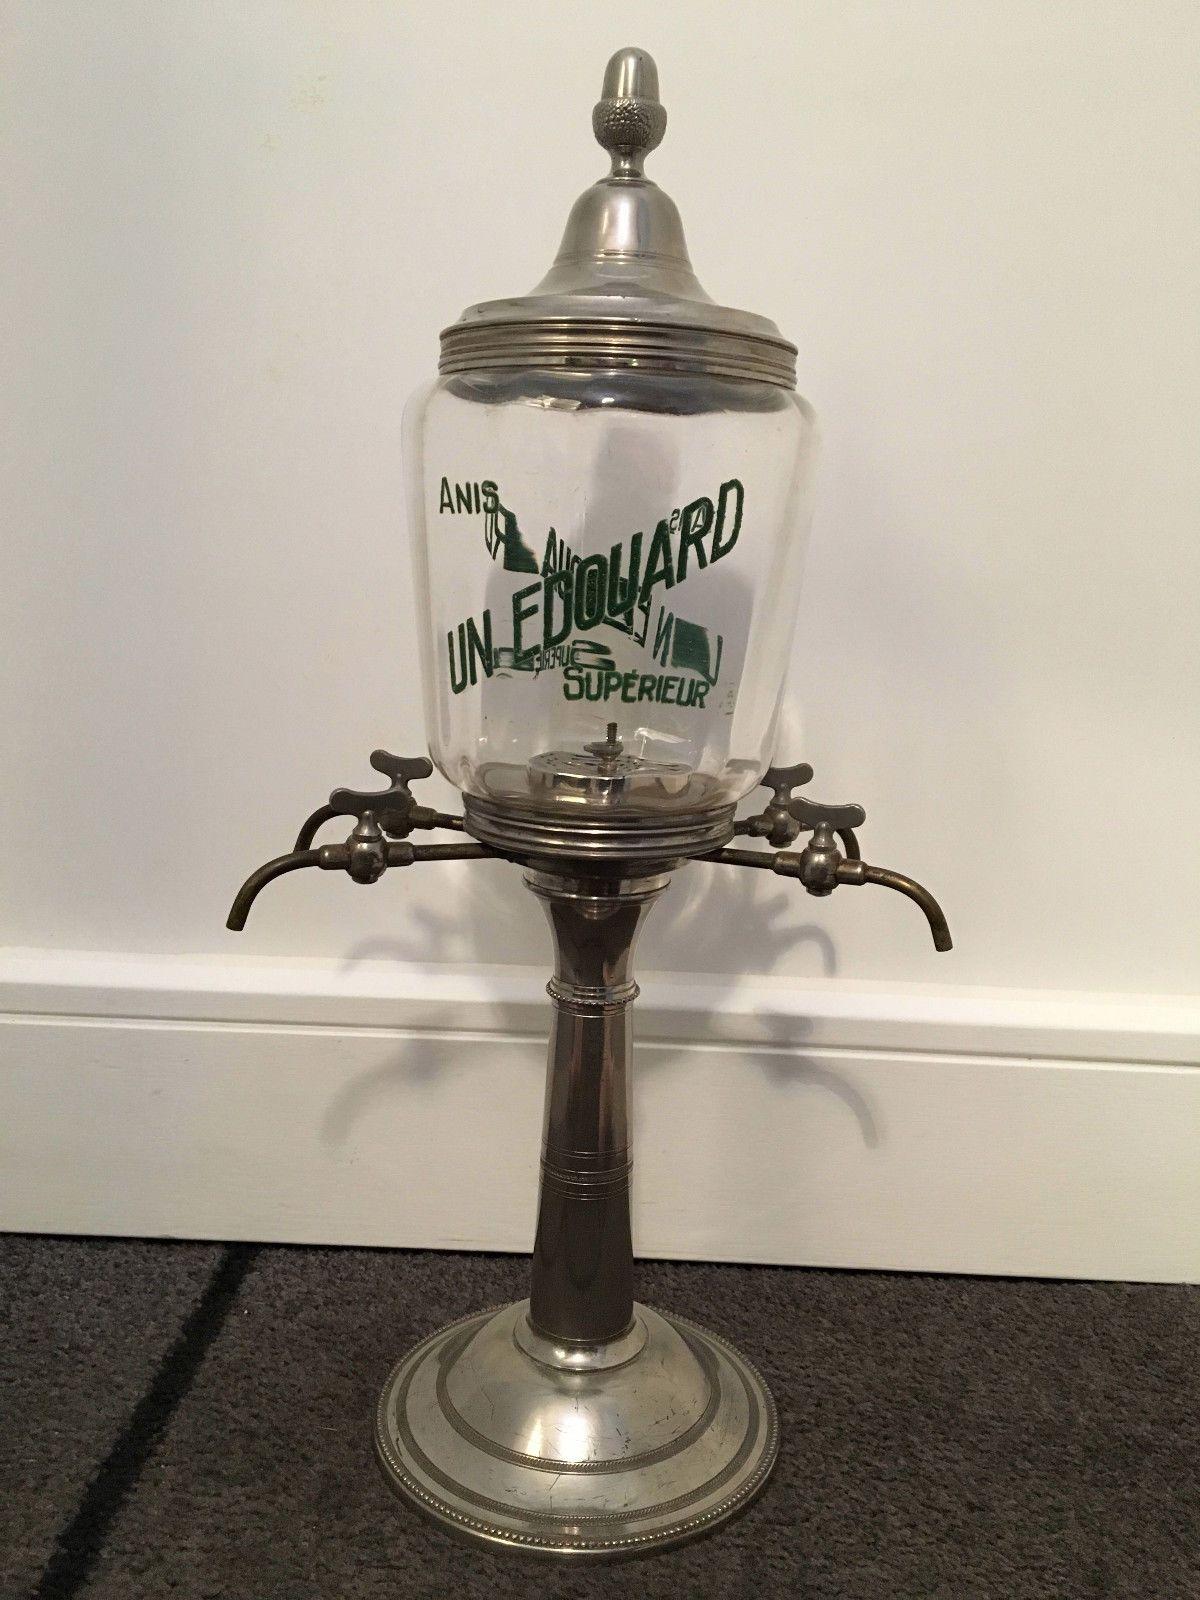 Rare Ancienne Fontaine Absinthe Anis Un Edouard A Voir Destockage Absinthe Ebay